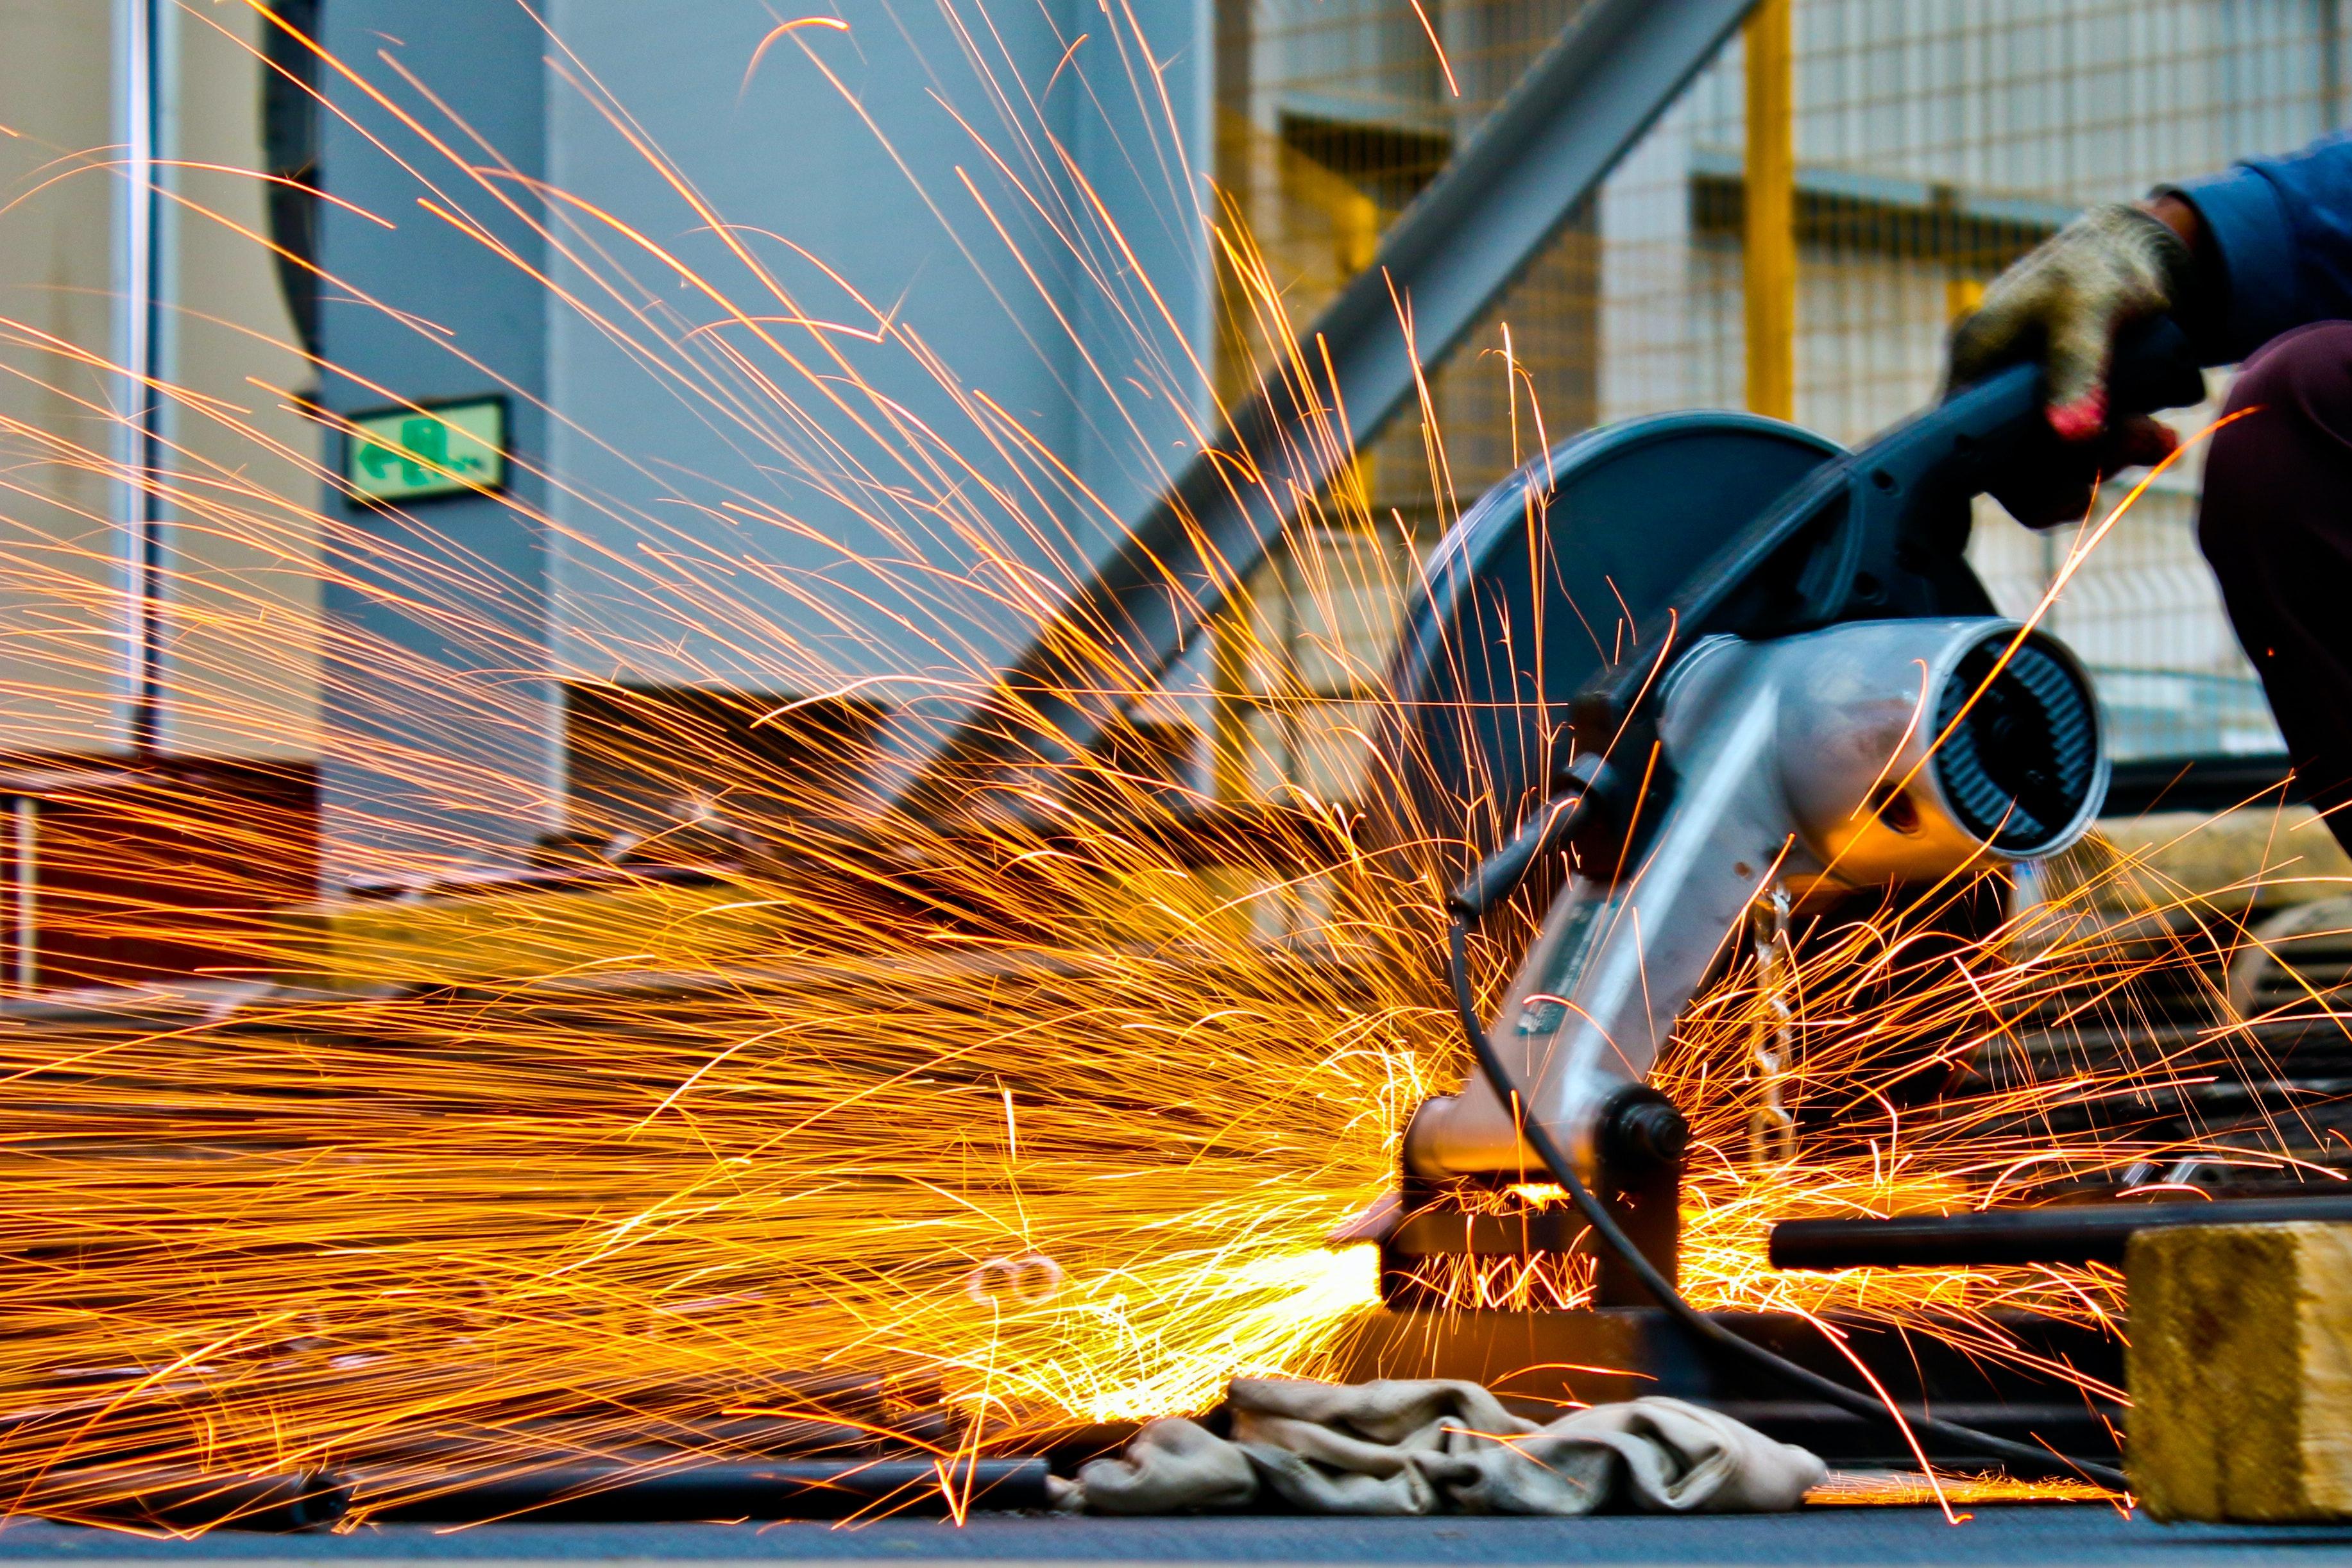 Construction Equipment Rental Business Serving Local Community